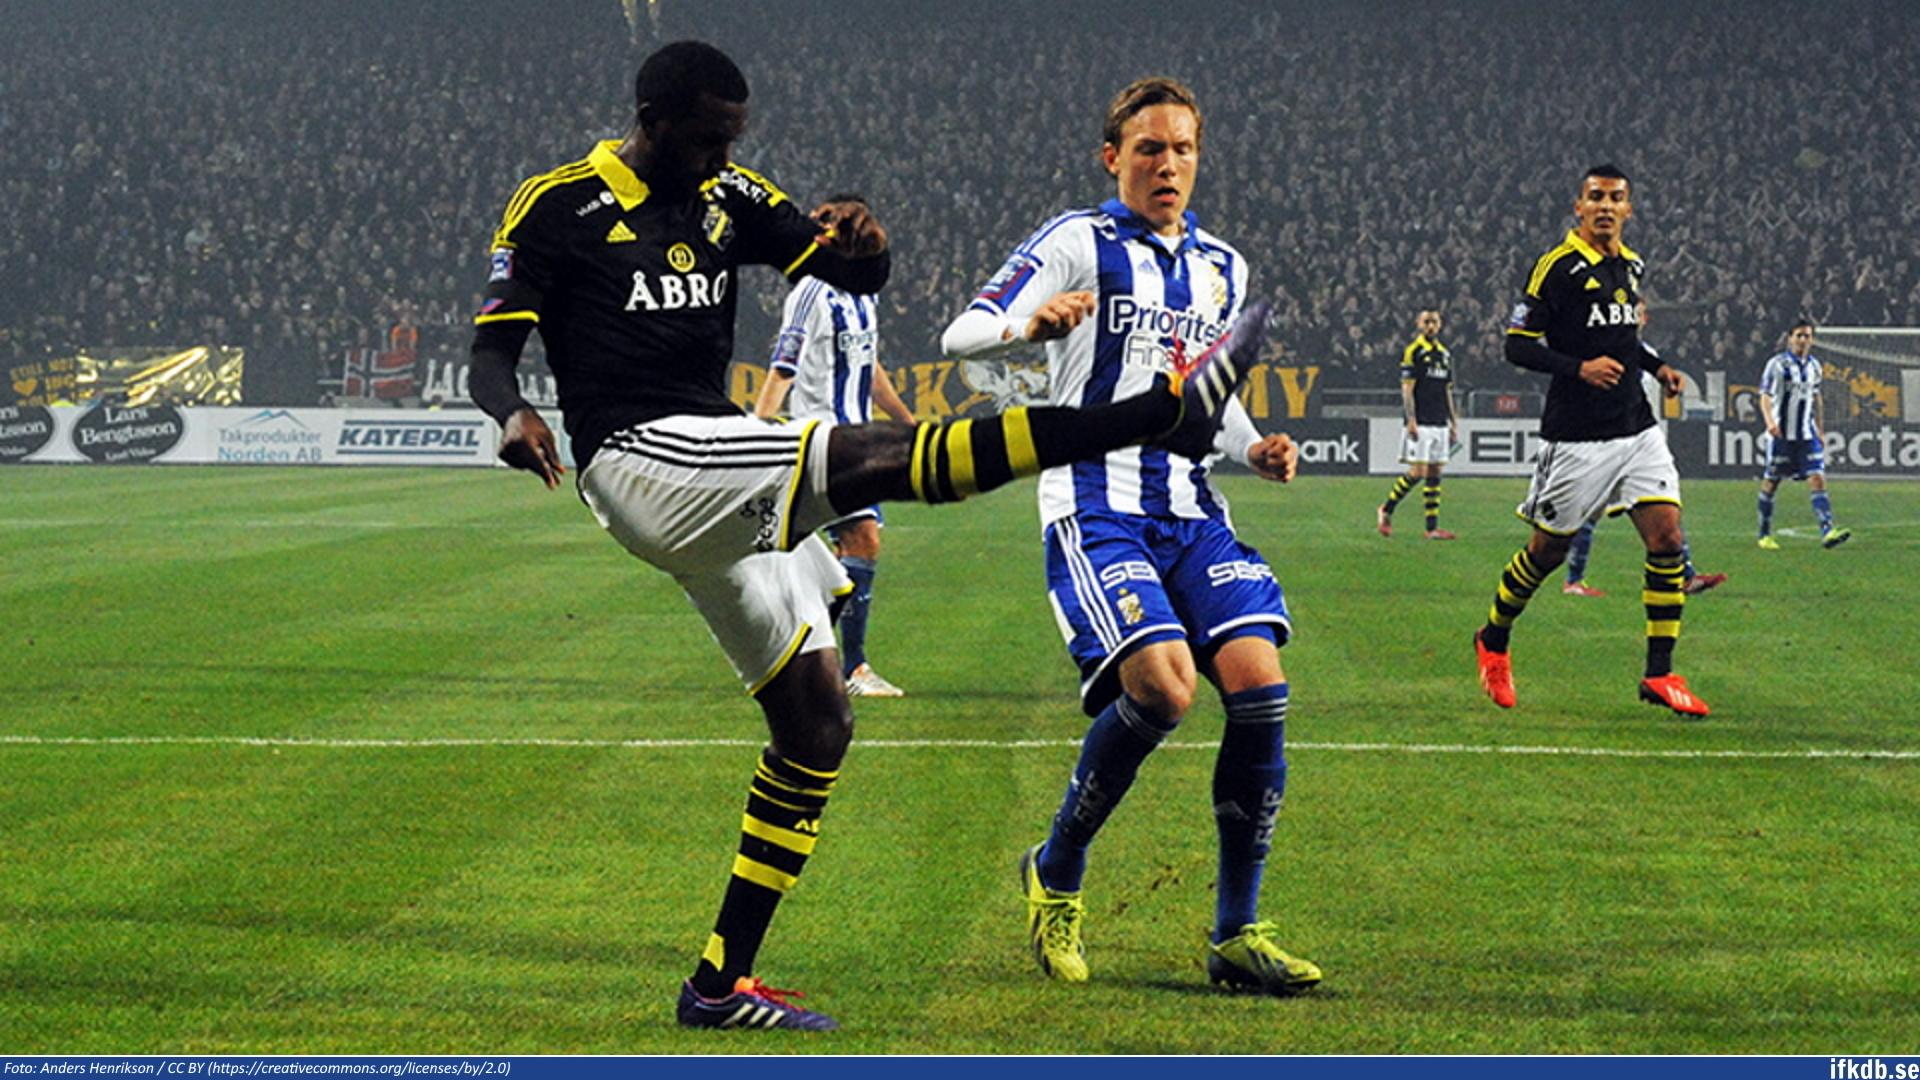 Monday 31st of March 2014: AIK – IFK Göteborg 0–2